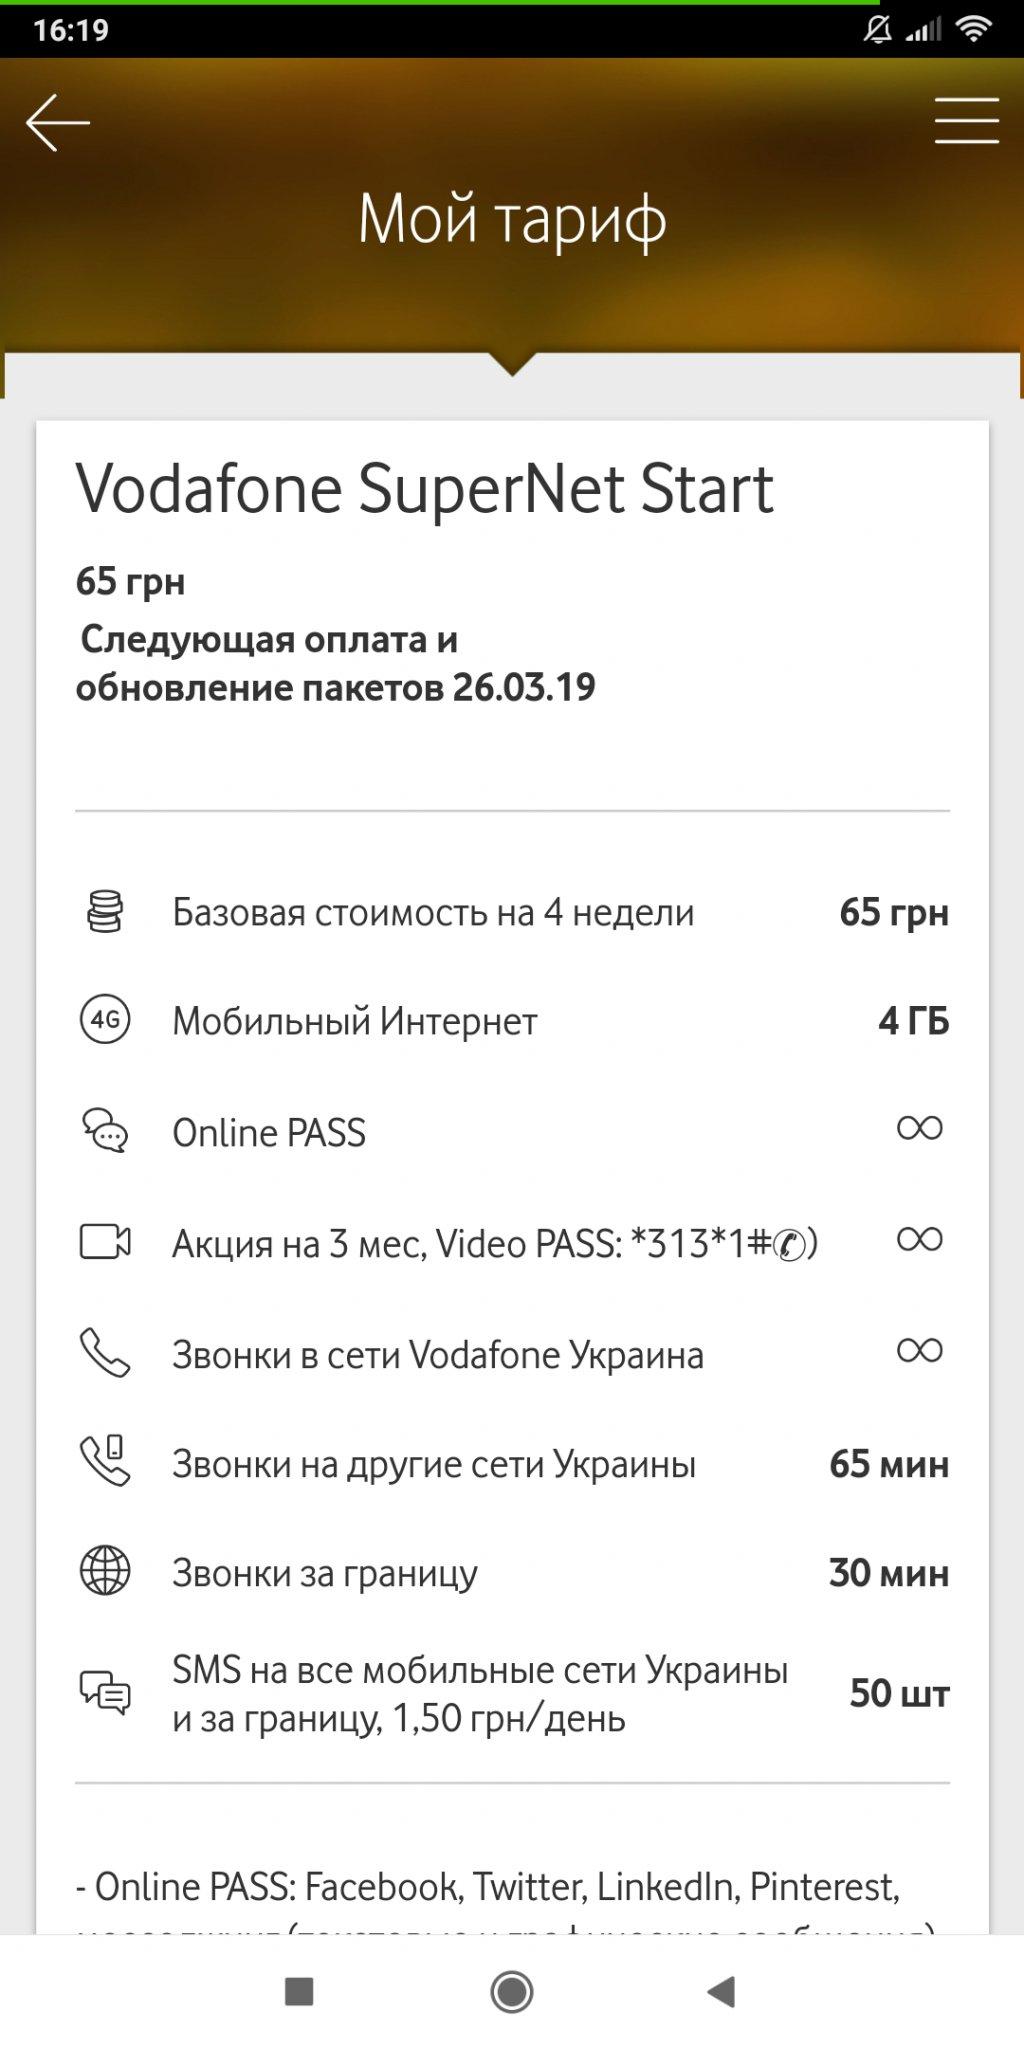 Vodafone Украина - Повышение стоимости тарифа.